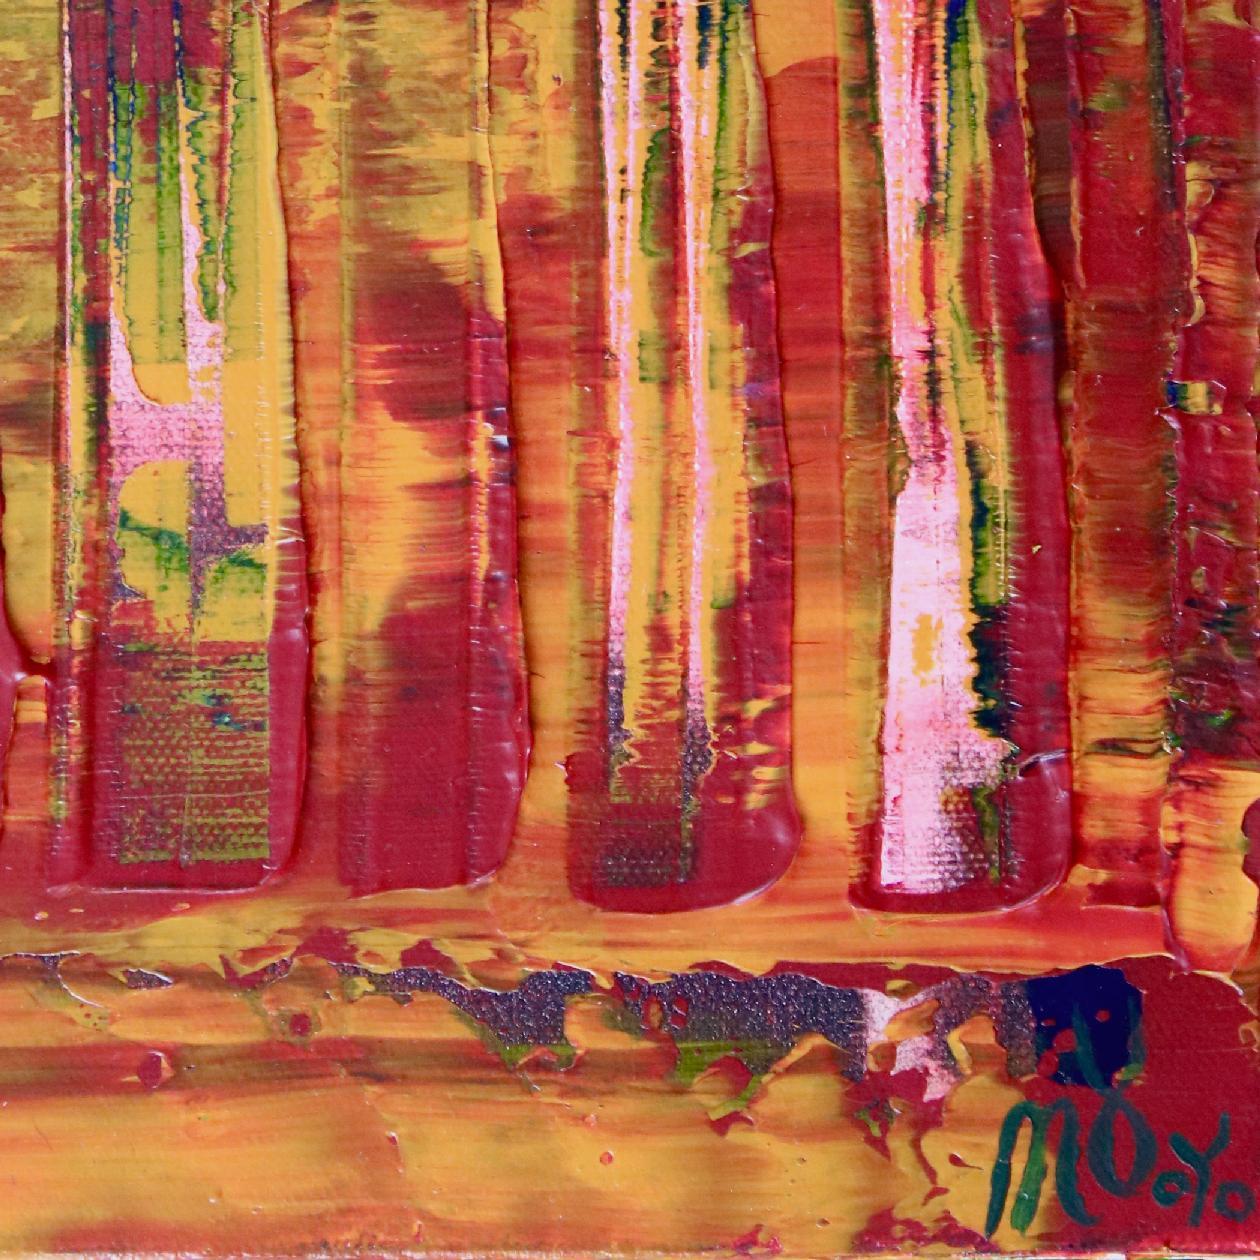 Signature - Sunset intrusions (Orange Sky) 2 (2020) Abstract Acrylic painting by Nestor Toro